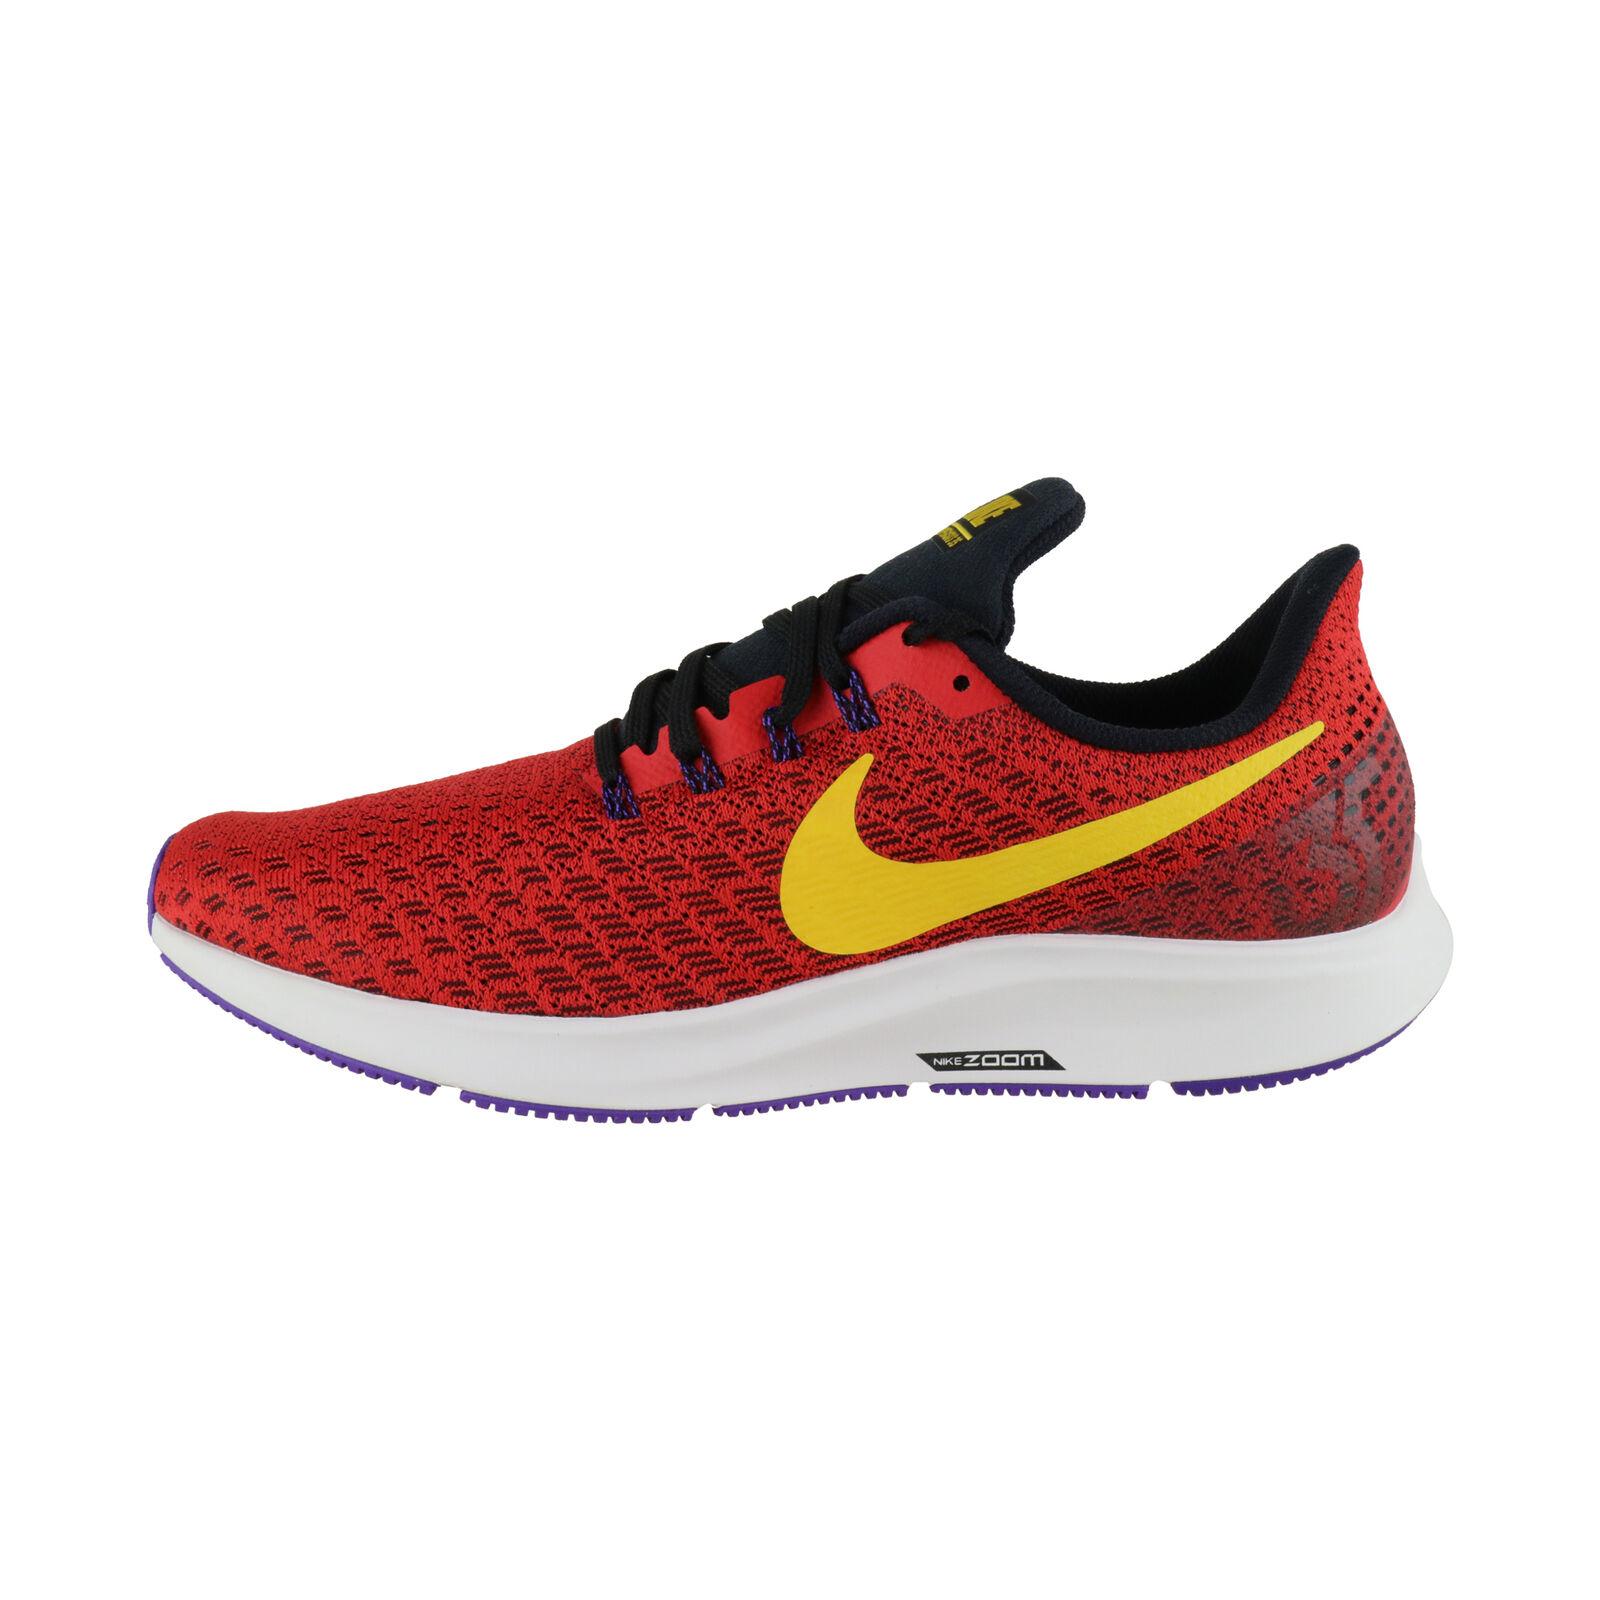 Details zu Nike Air Zoom Pegasus 35 rotorange 942851 603